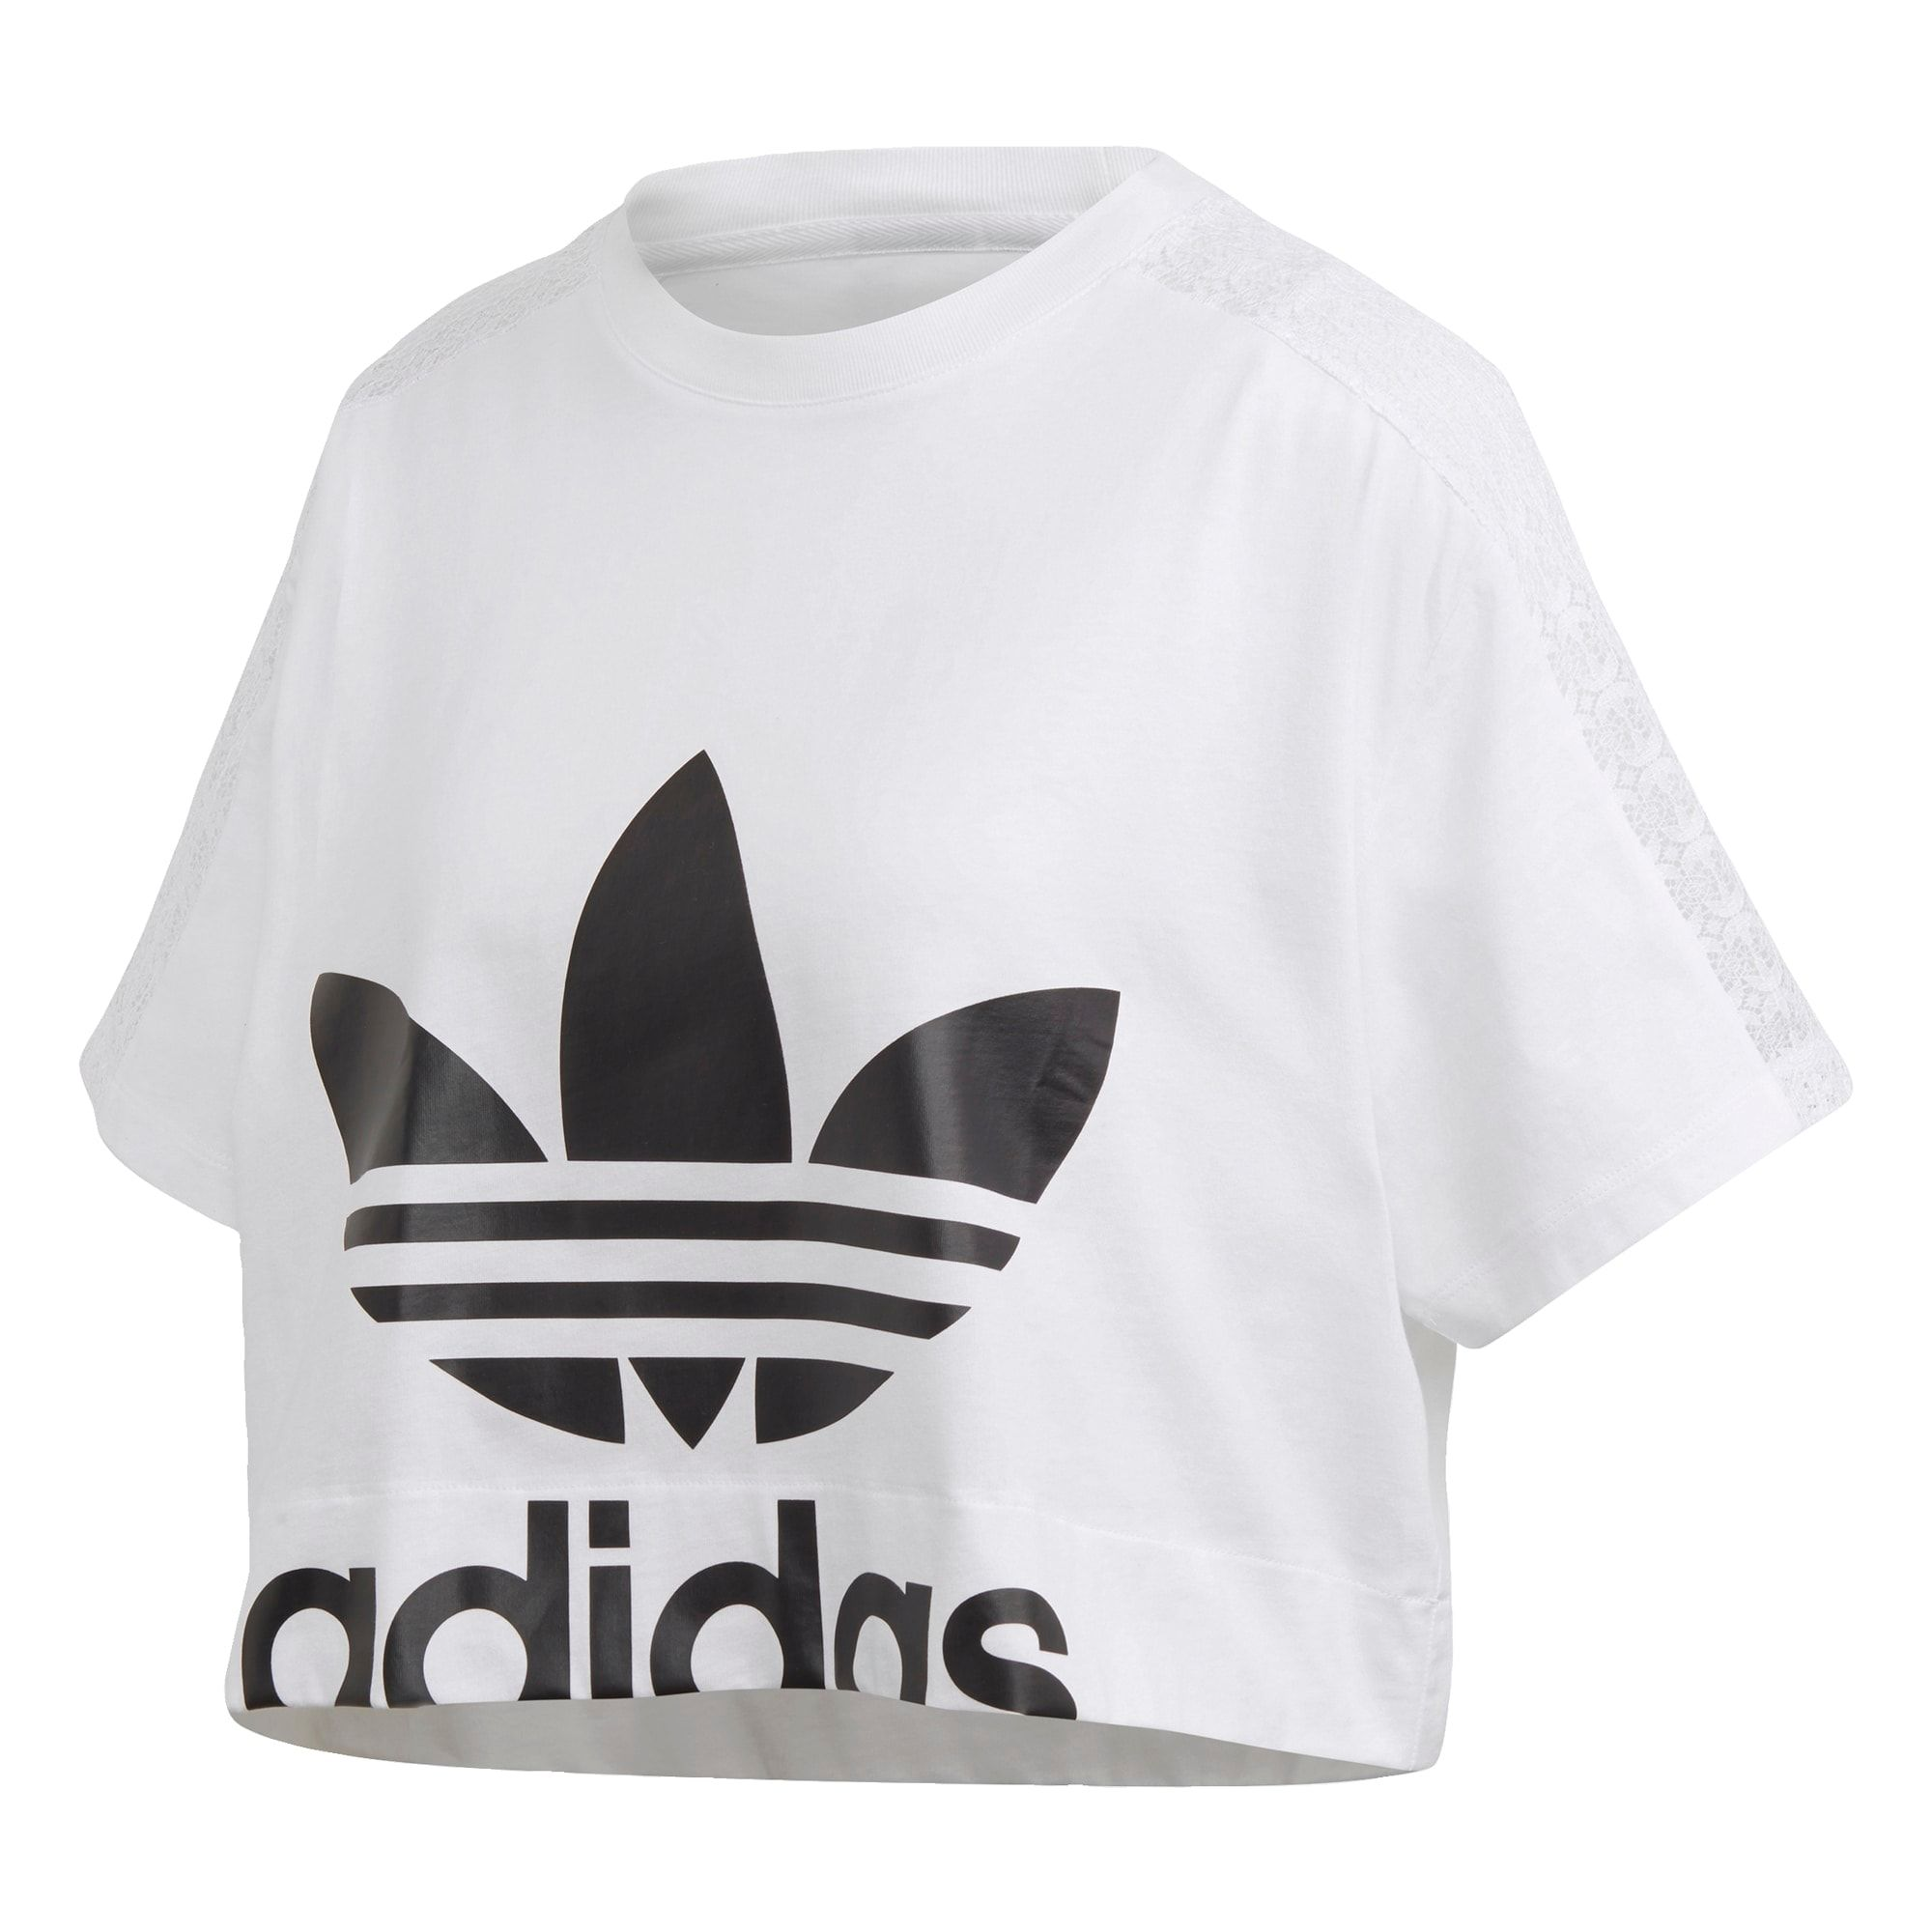 Adidas Originals T Shirt Damen Weiss Schwarz Grosse Xs S In 2020 Spitzen T Shirt T Shirt Damen Und Adidas Originals